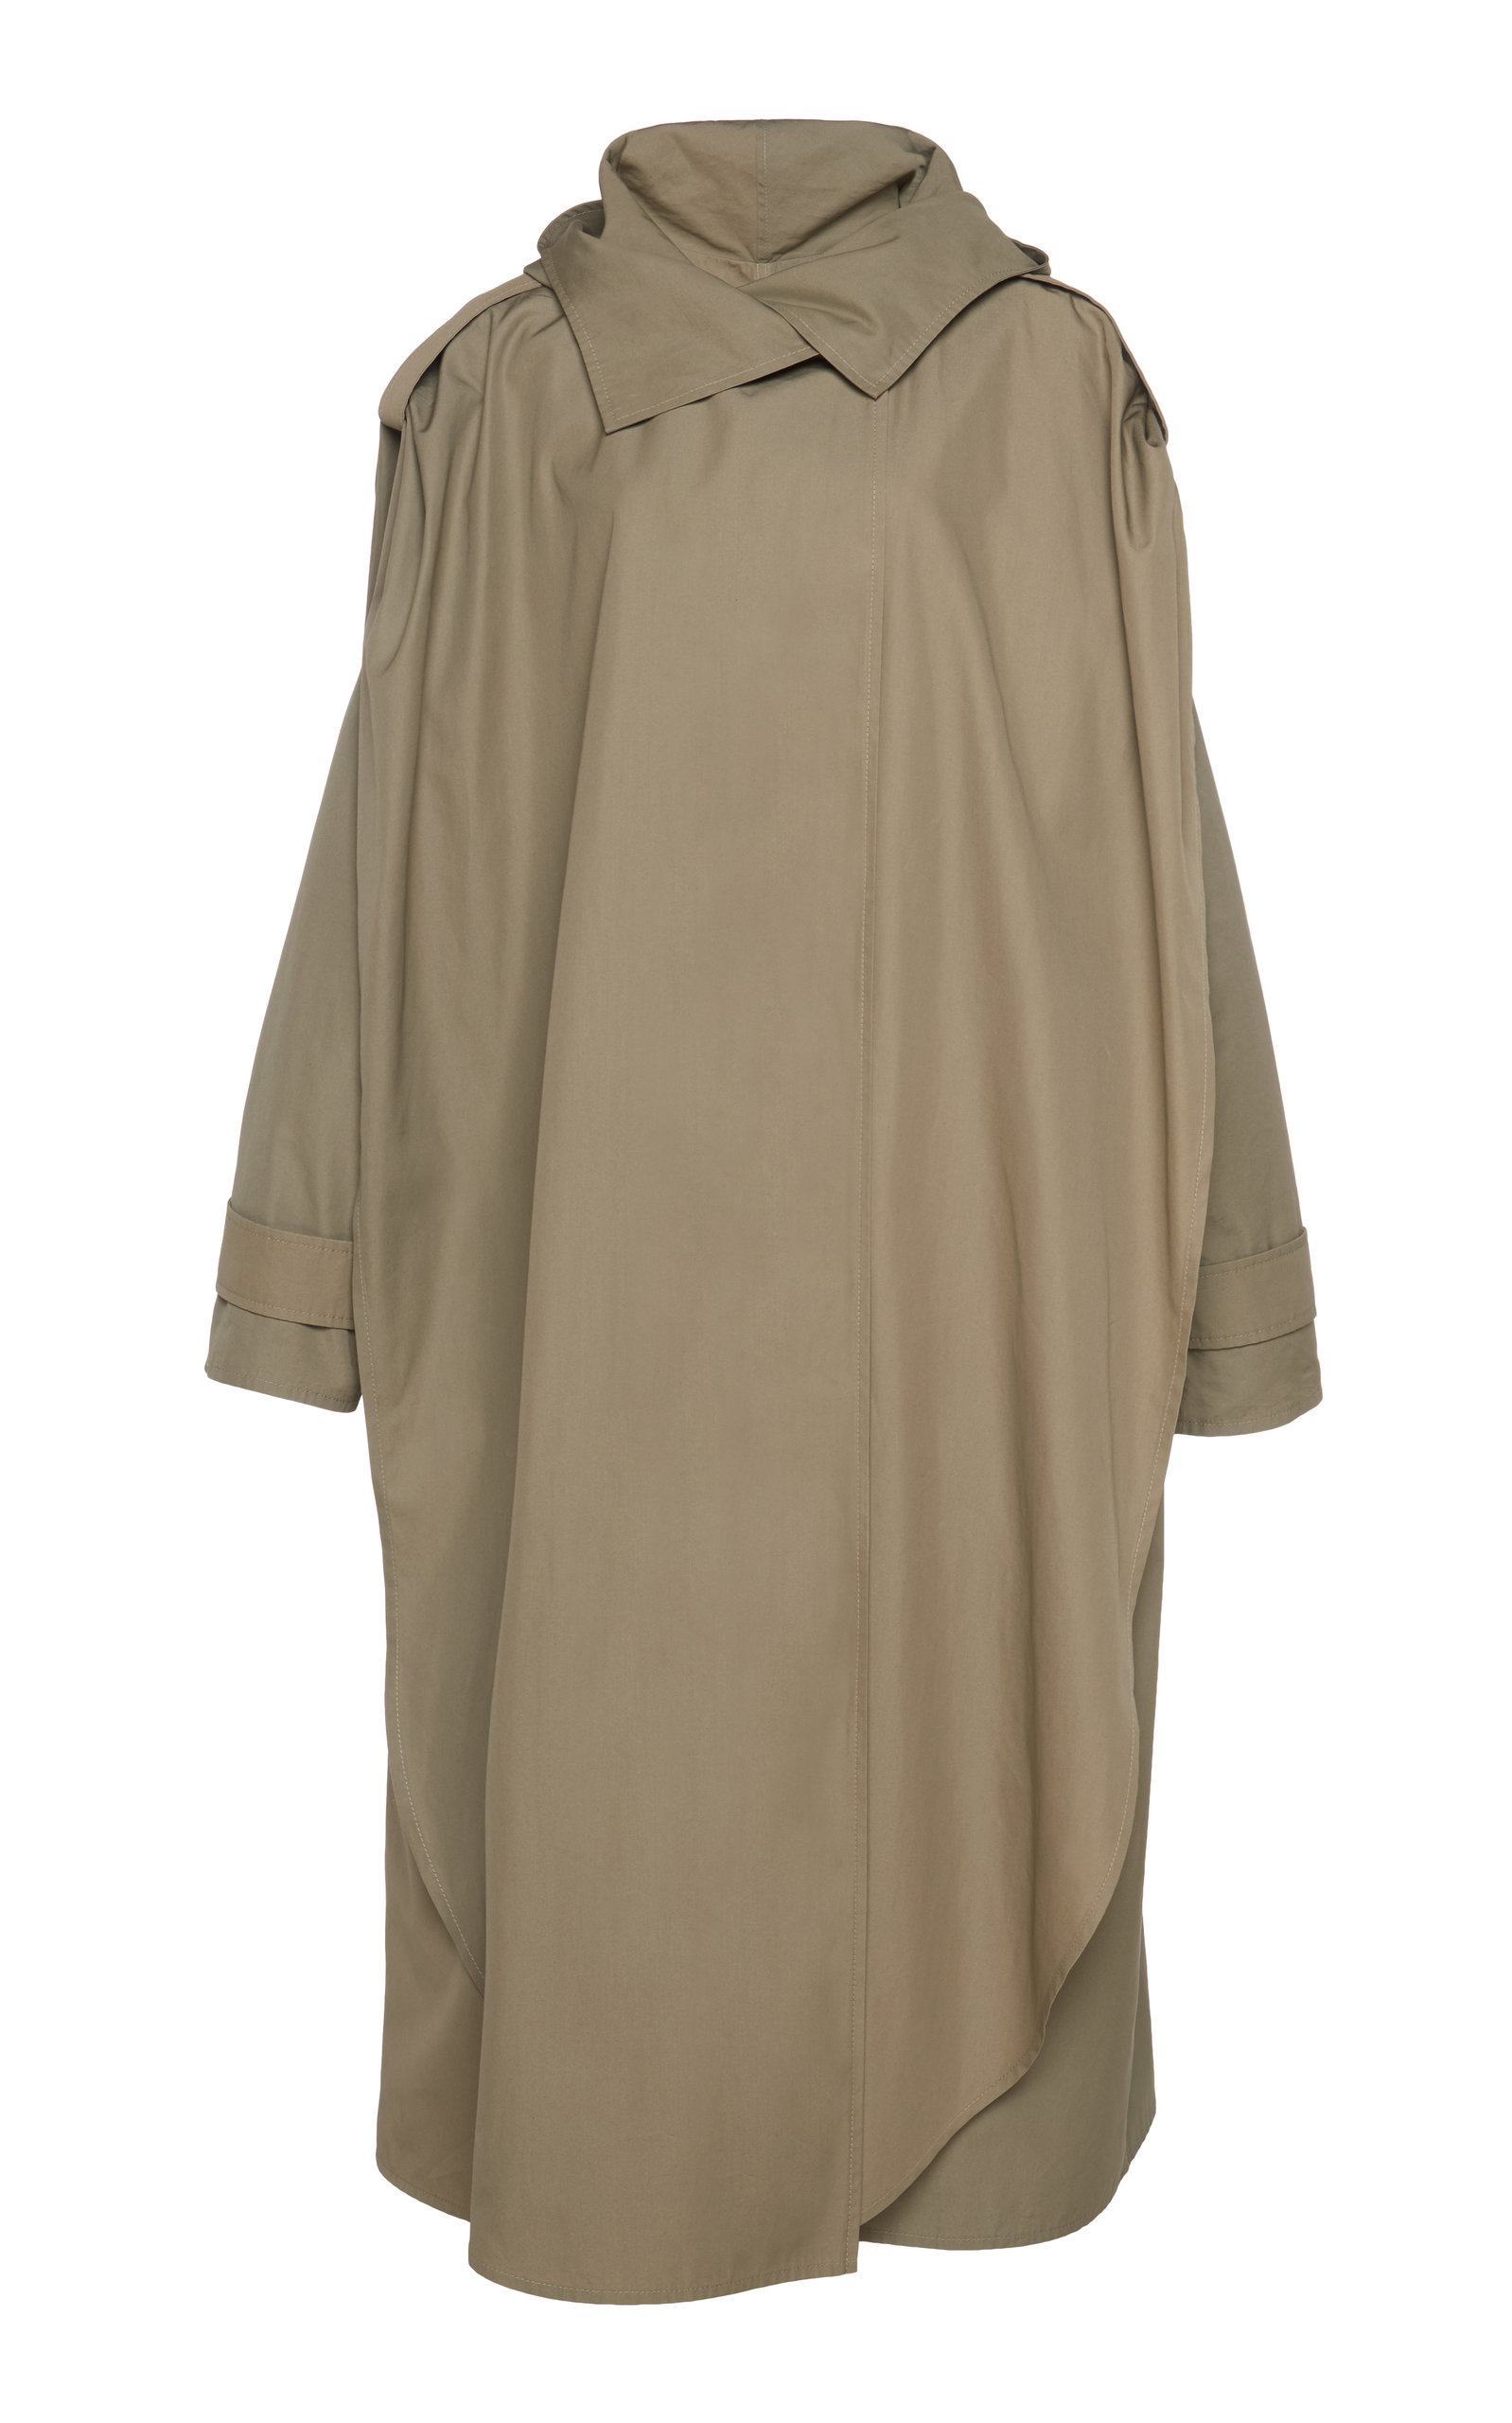 Bottega Veneta - Women's Oversized Layered Cotton Trench  - Neutral - Moda Operandi